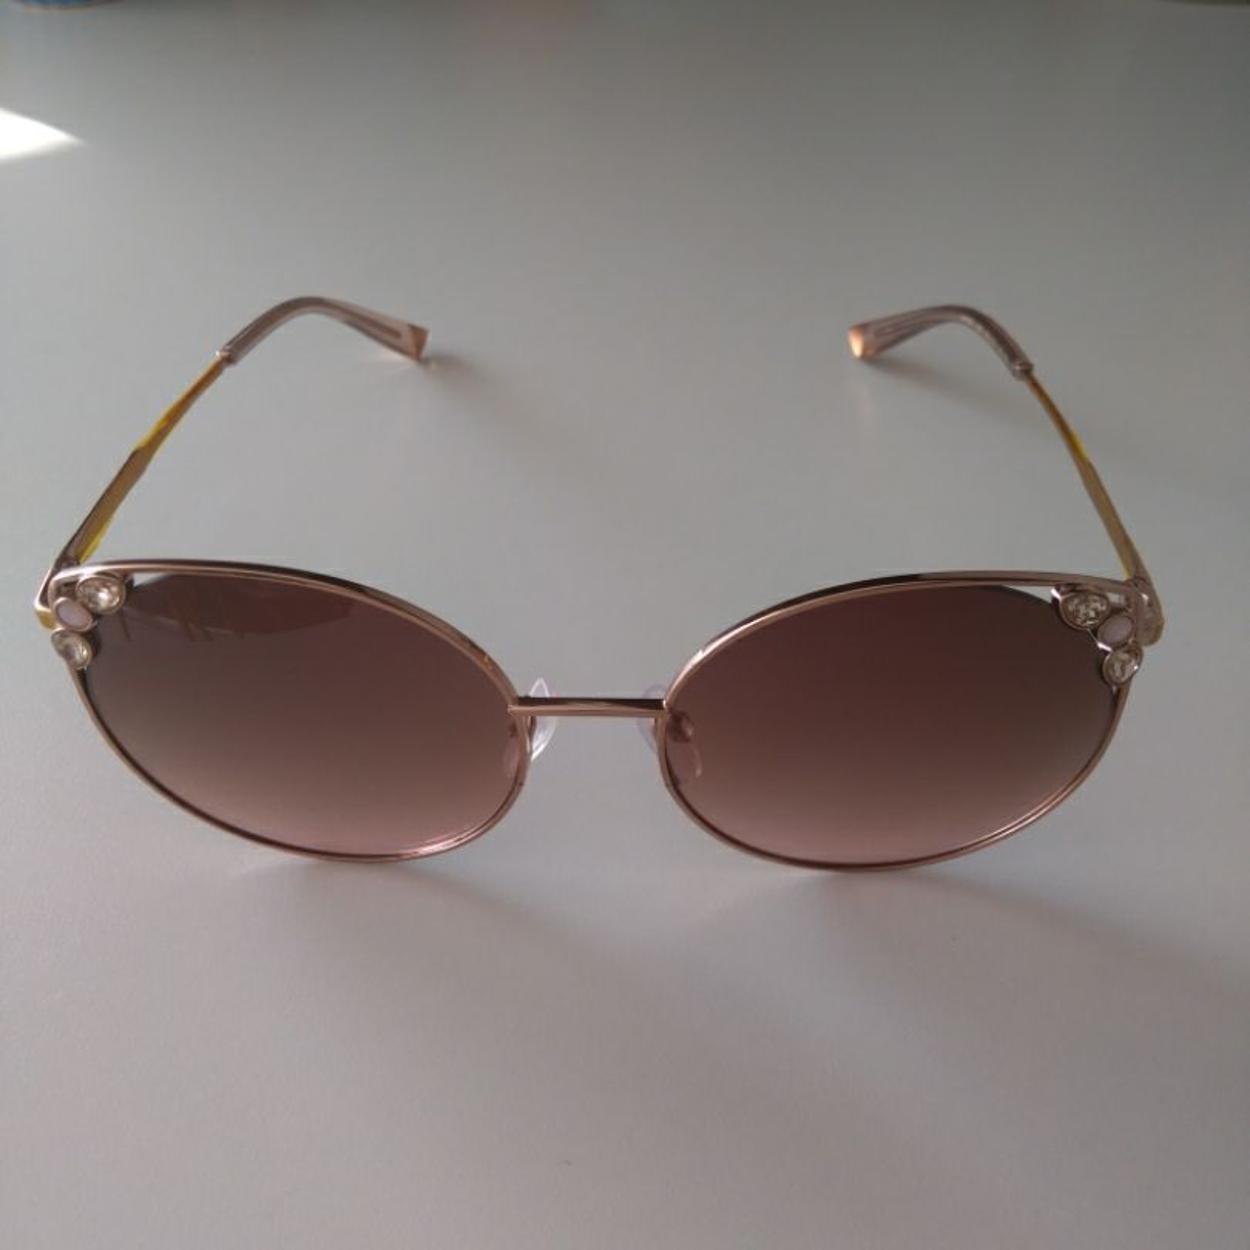 Ana Hickmann Gözlük